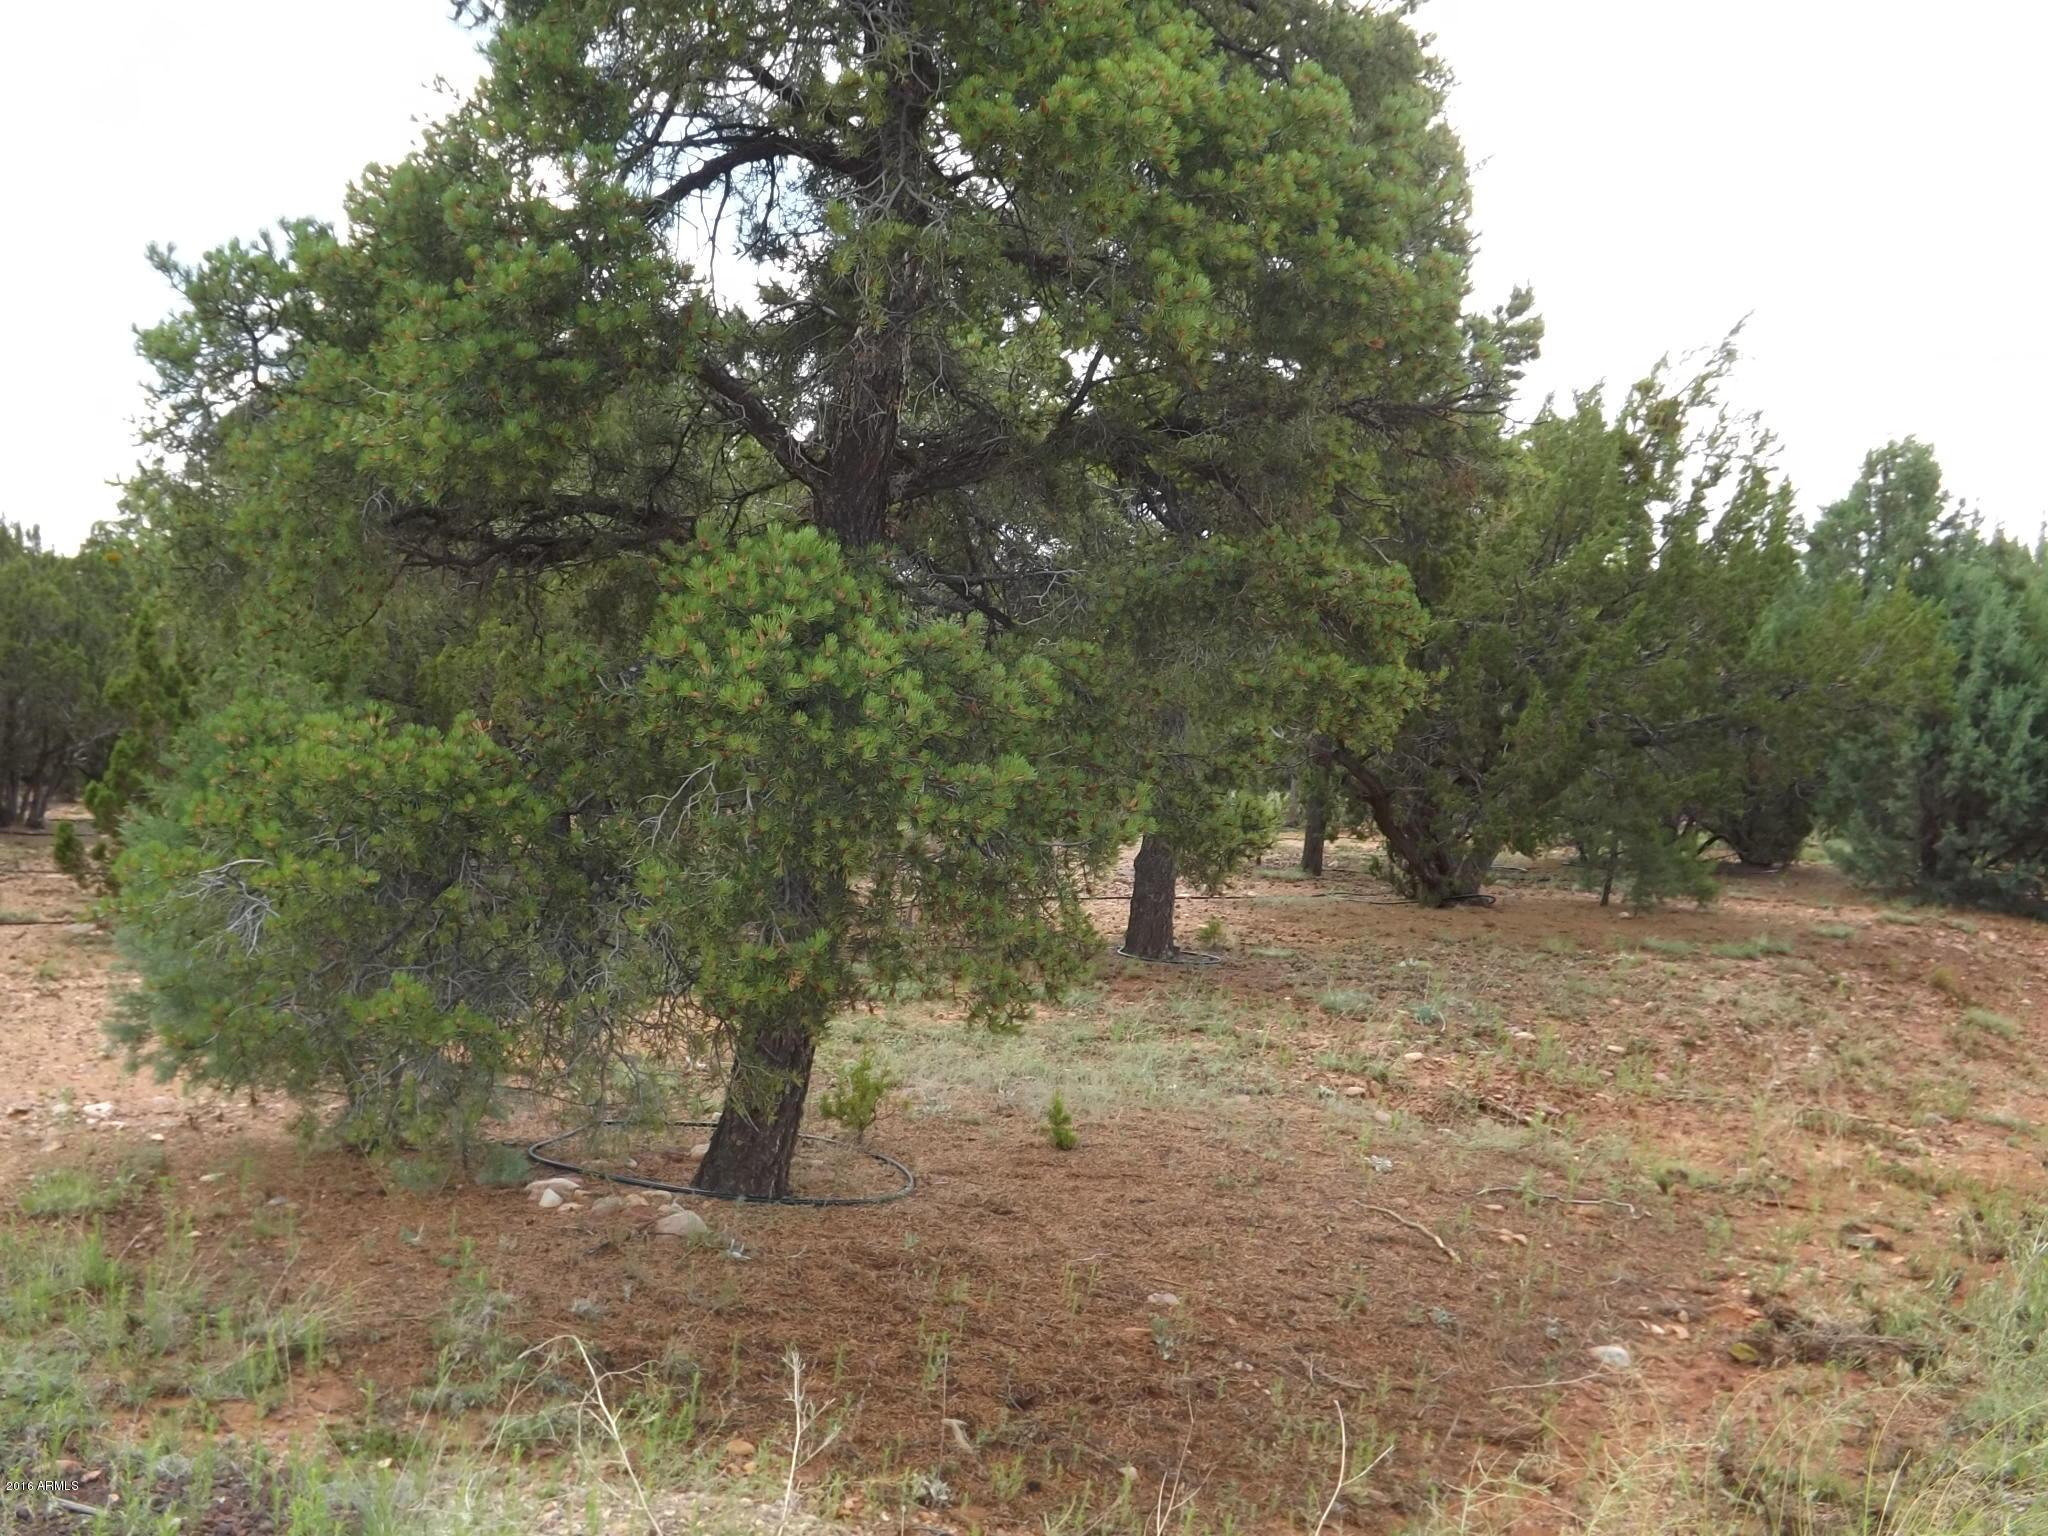 2802 CHANDELLE Lane # 334, Overgaard, Arizona 85933, ,Land,For Sale,2802 CHANDELLE Lane # 334,6023580